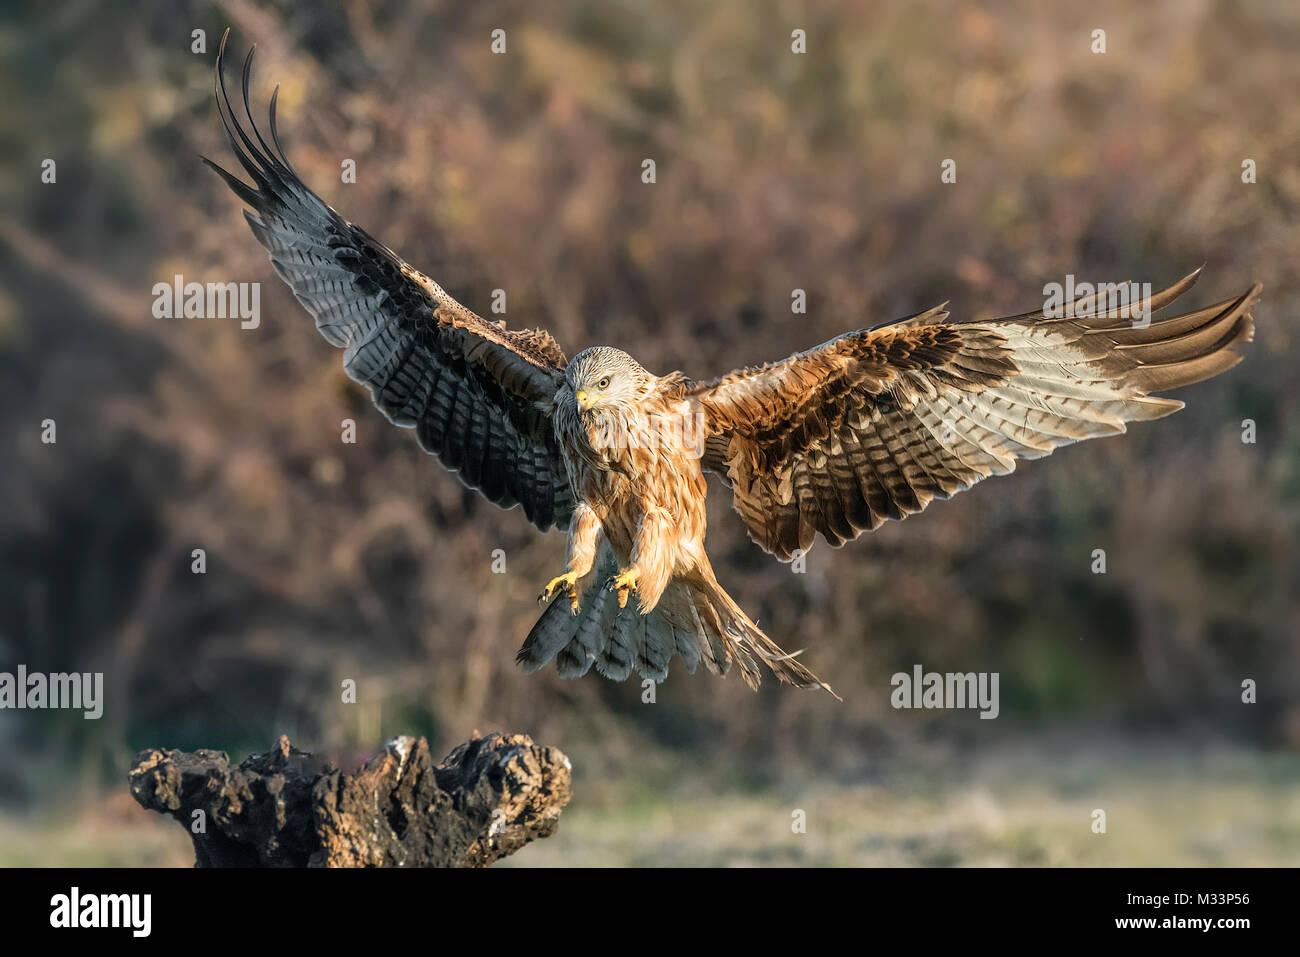 milvus milvus, red kite - Stock Image